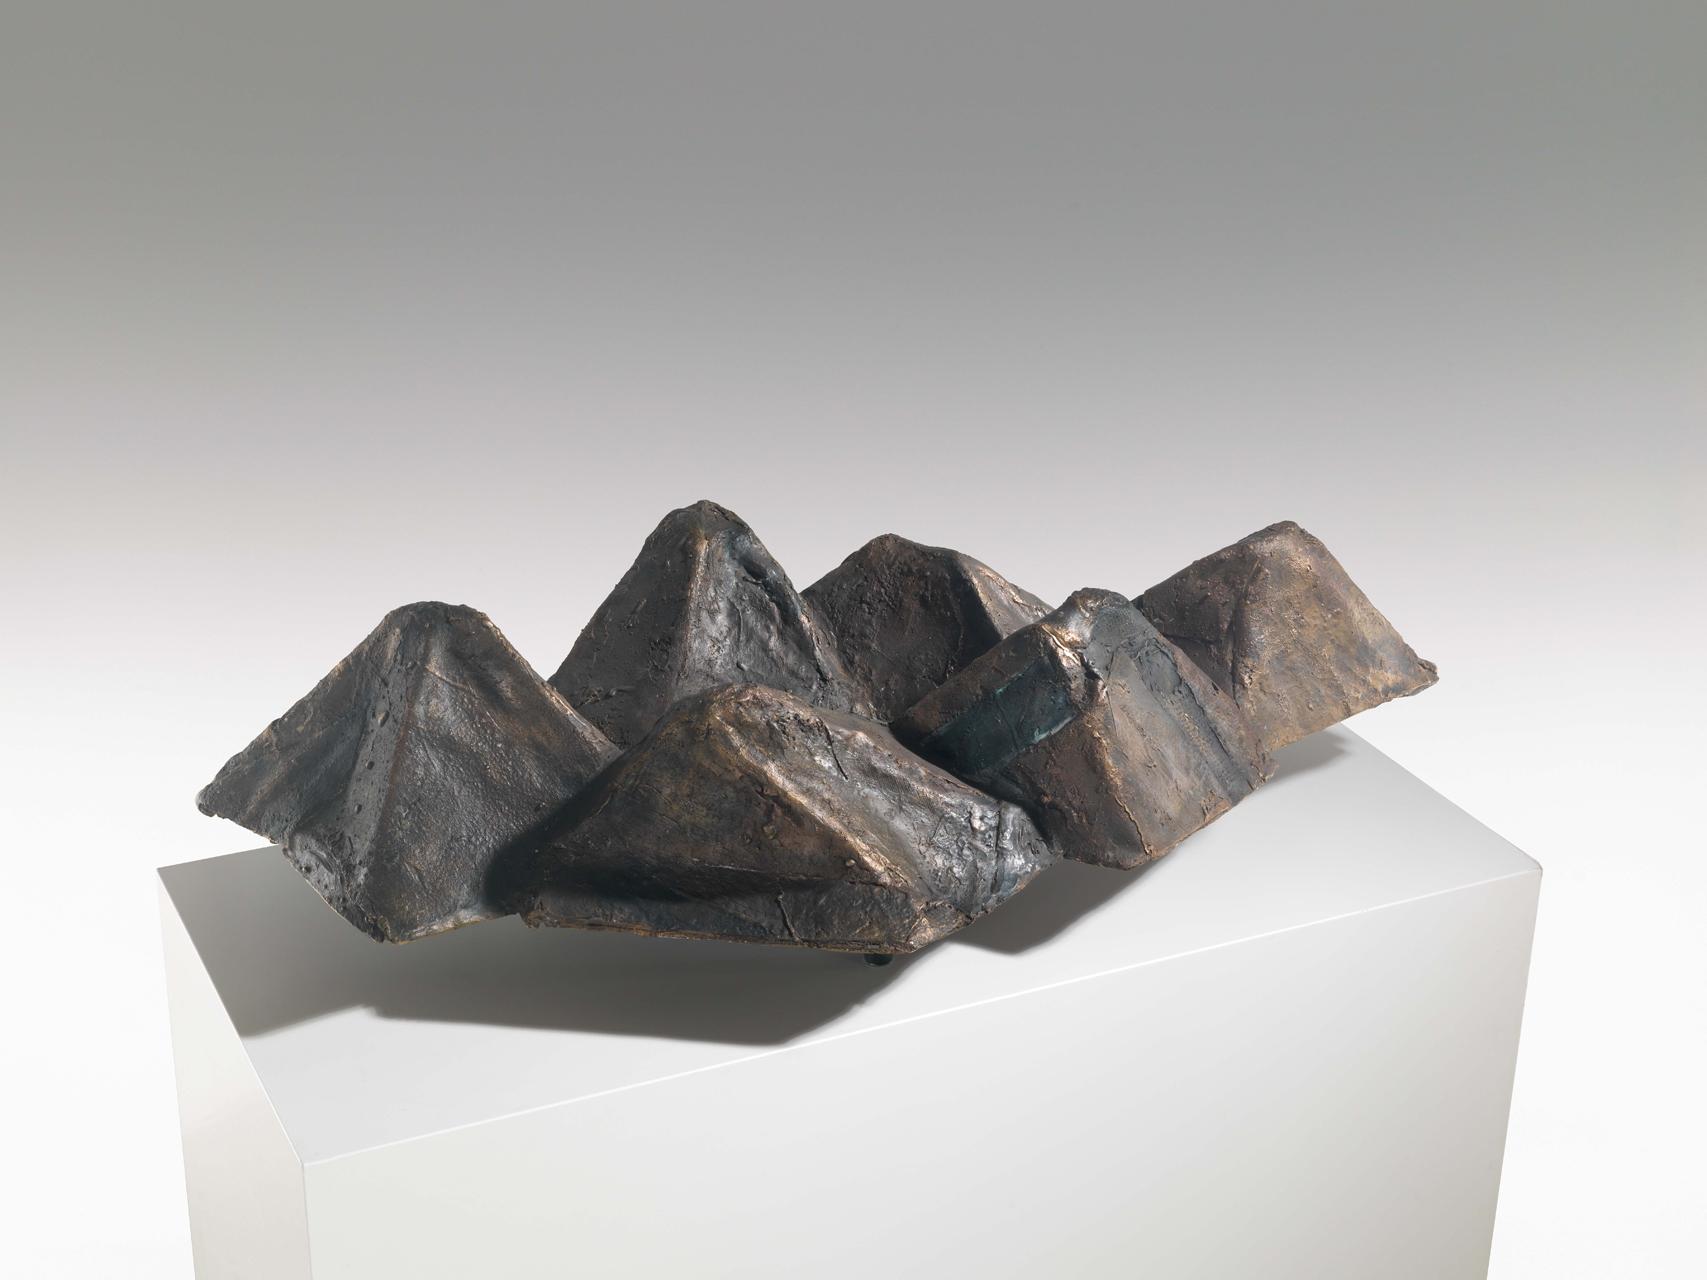 Emil Cimiotti, Berge, 1998, Bronze, gussrauh, 26 x 95 x 52 cm